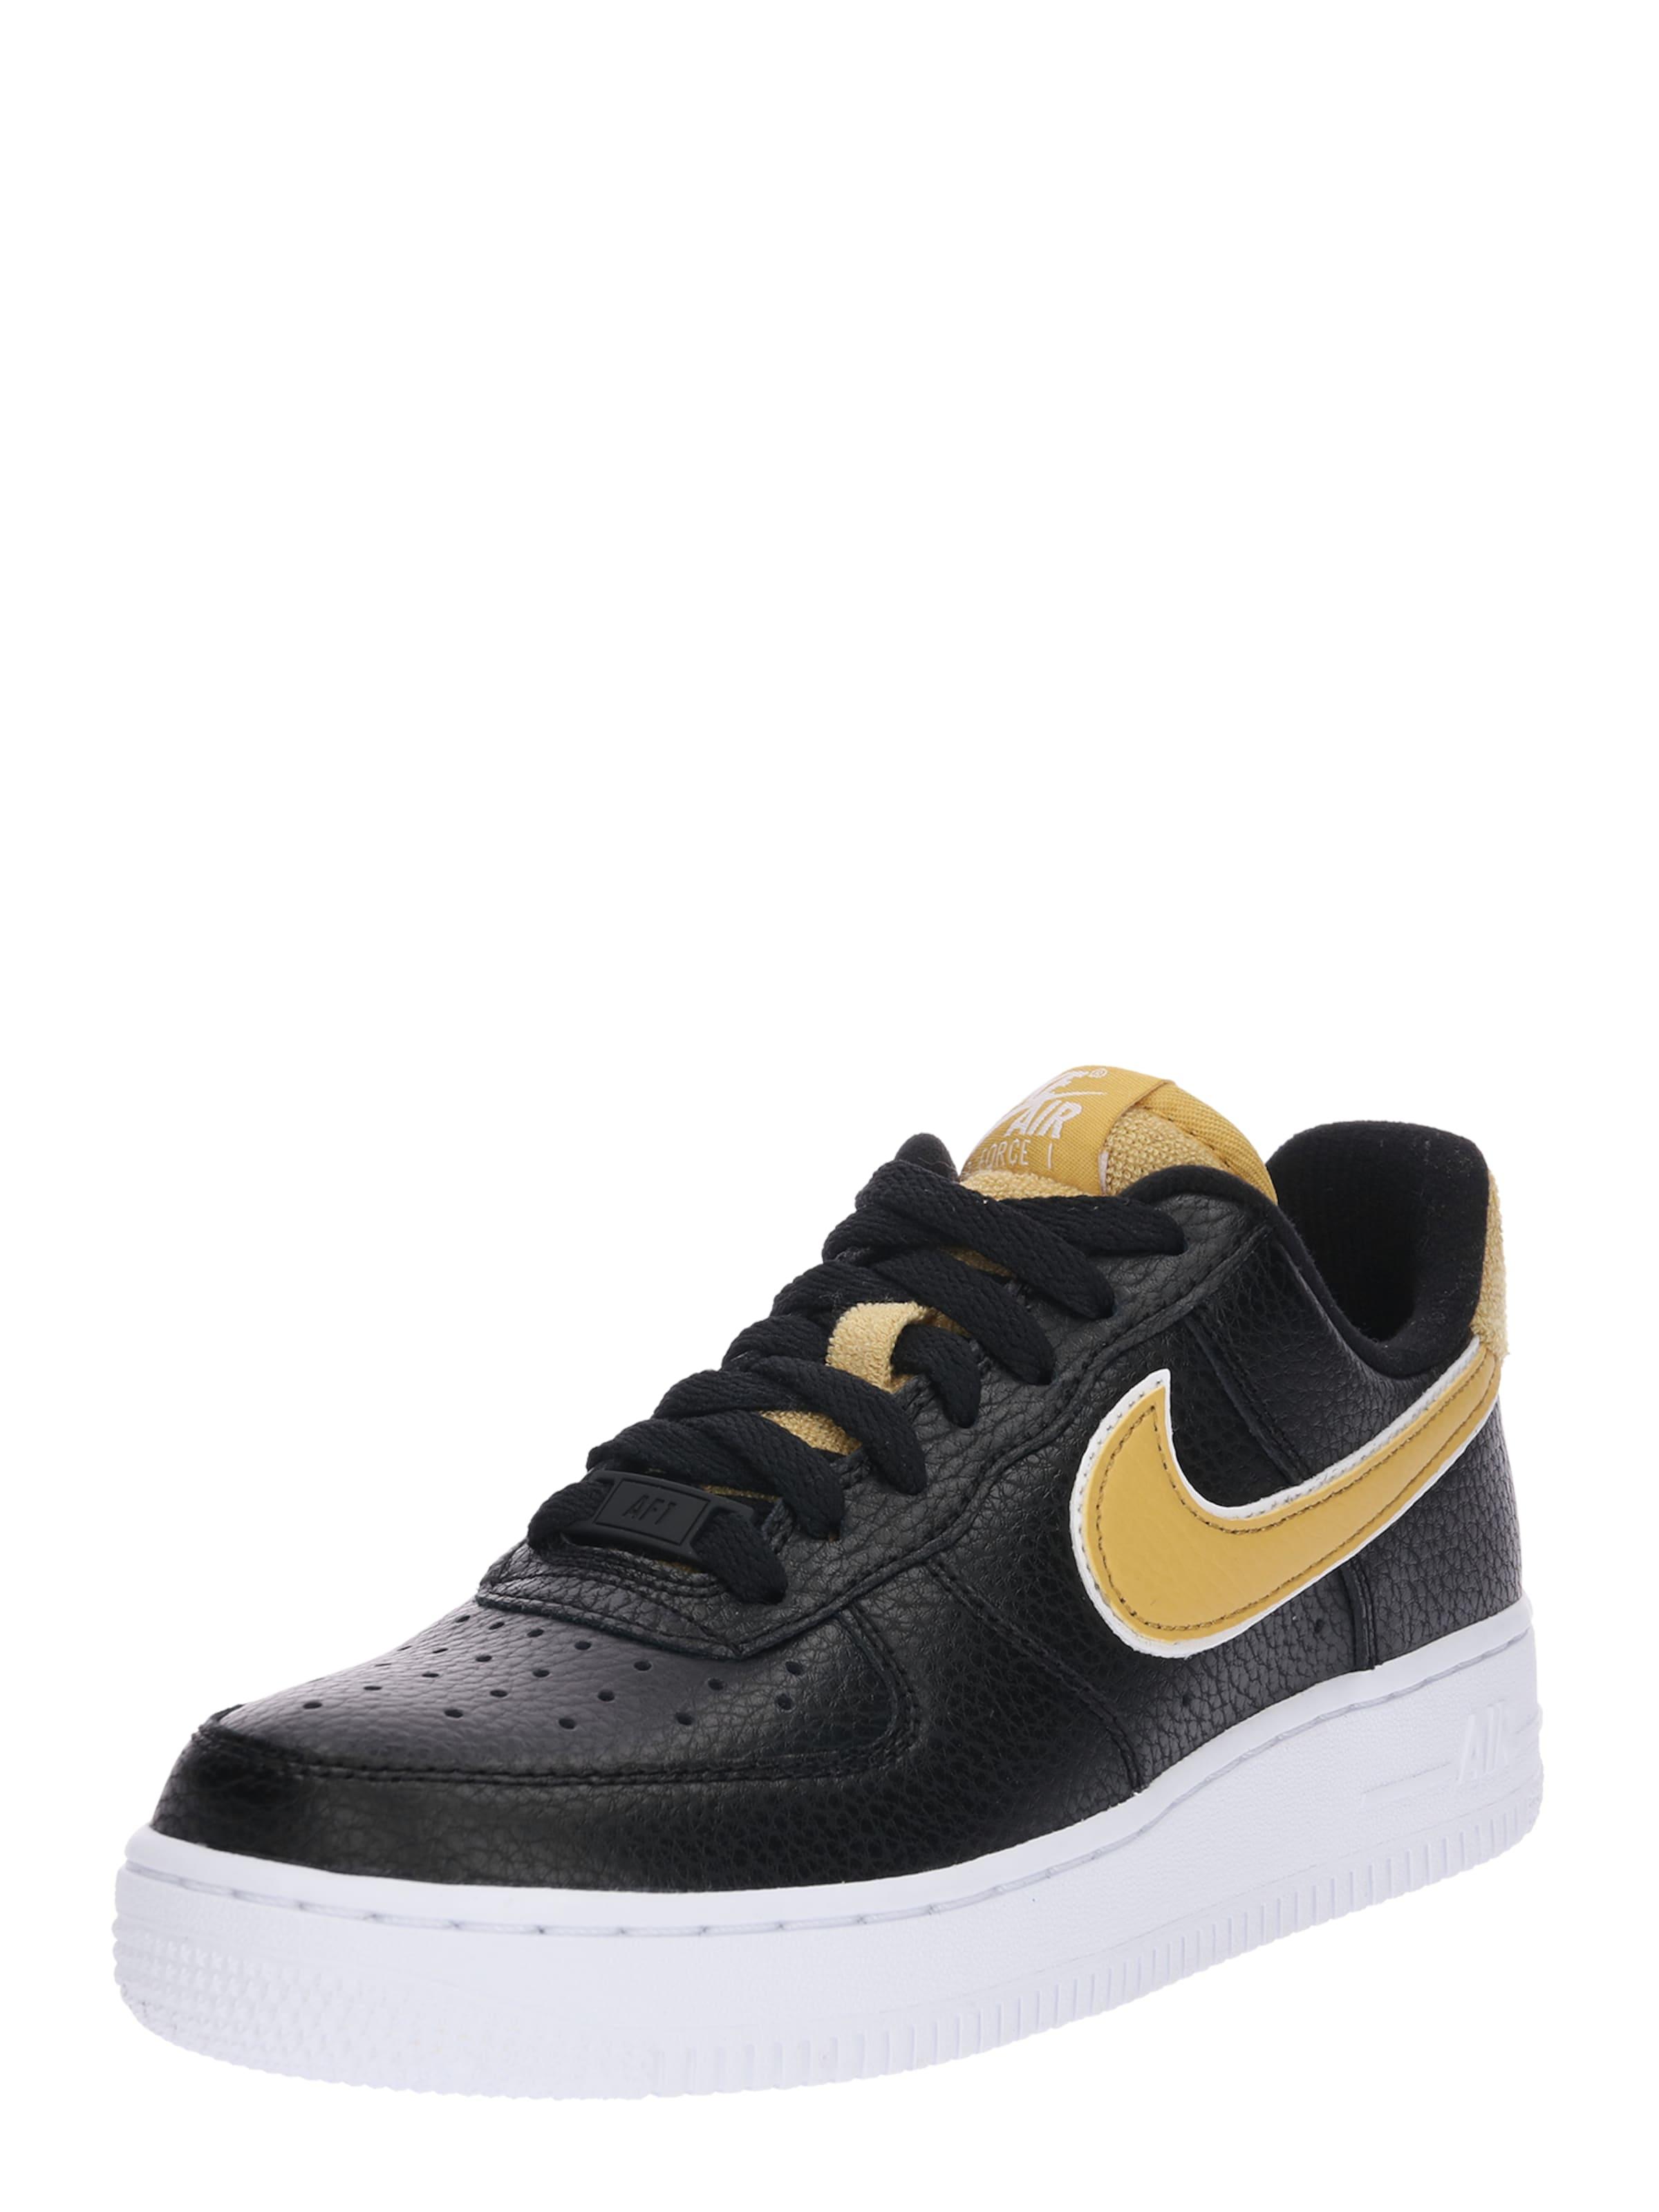 Nike Sportswear | TurnschuheLow   Air force 1  TurnschuheLow 07 81aab8